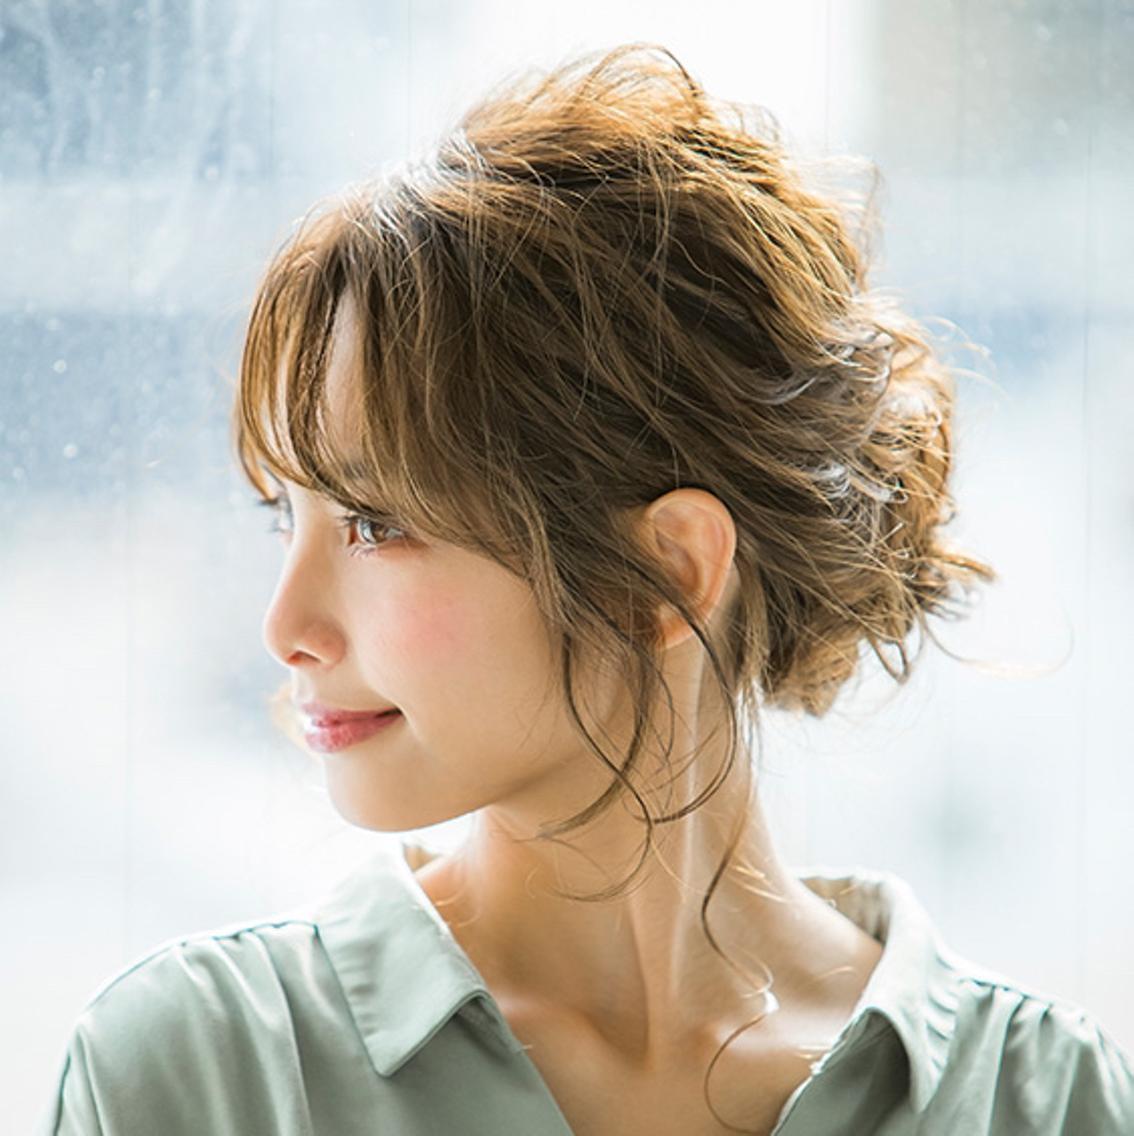 Blossom北浦和店所属・小林一寛の掲載